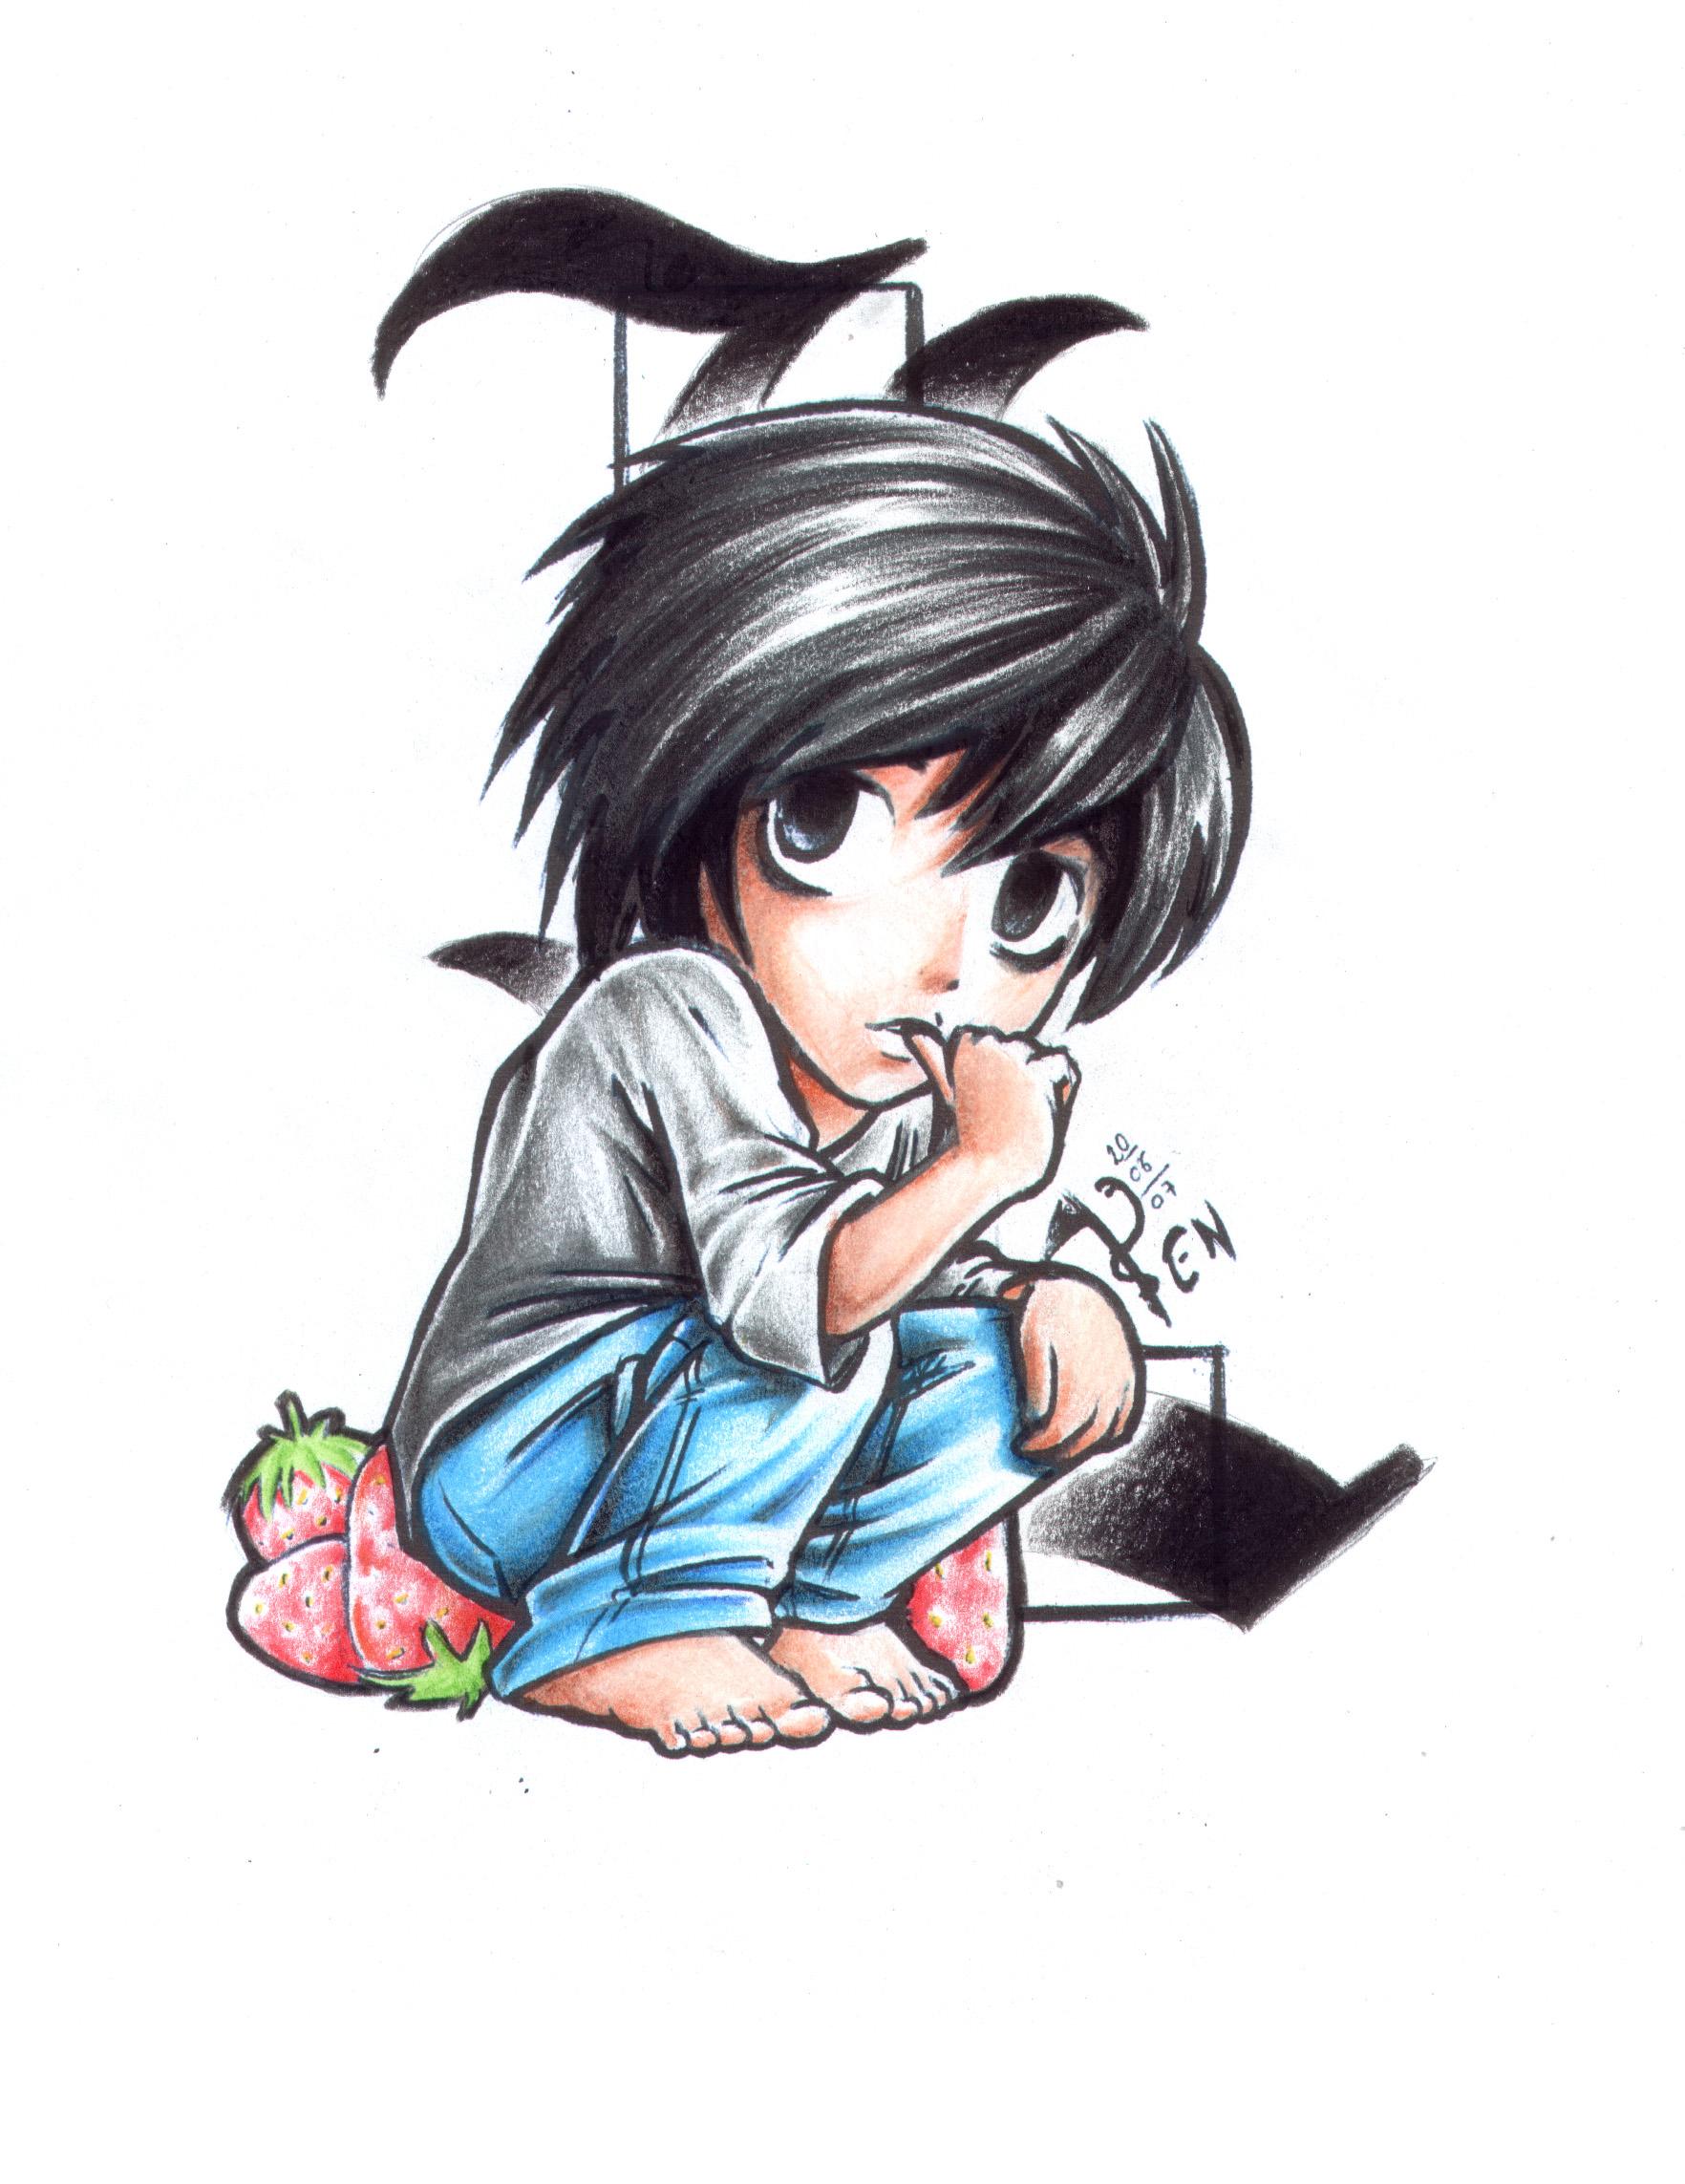 Album de Ryuzaki L_Chibi___Death_Note_by_FallenAngel_pen